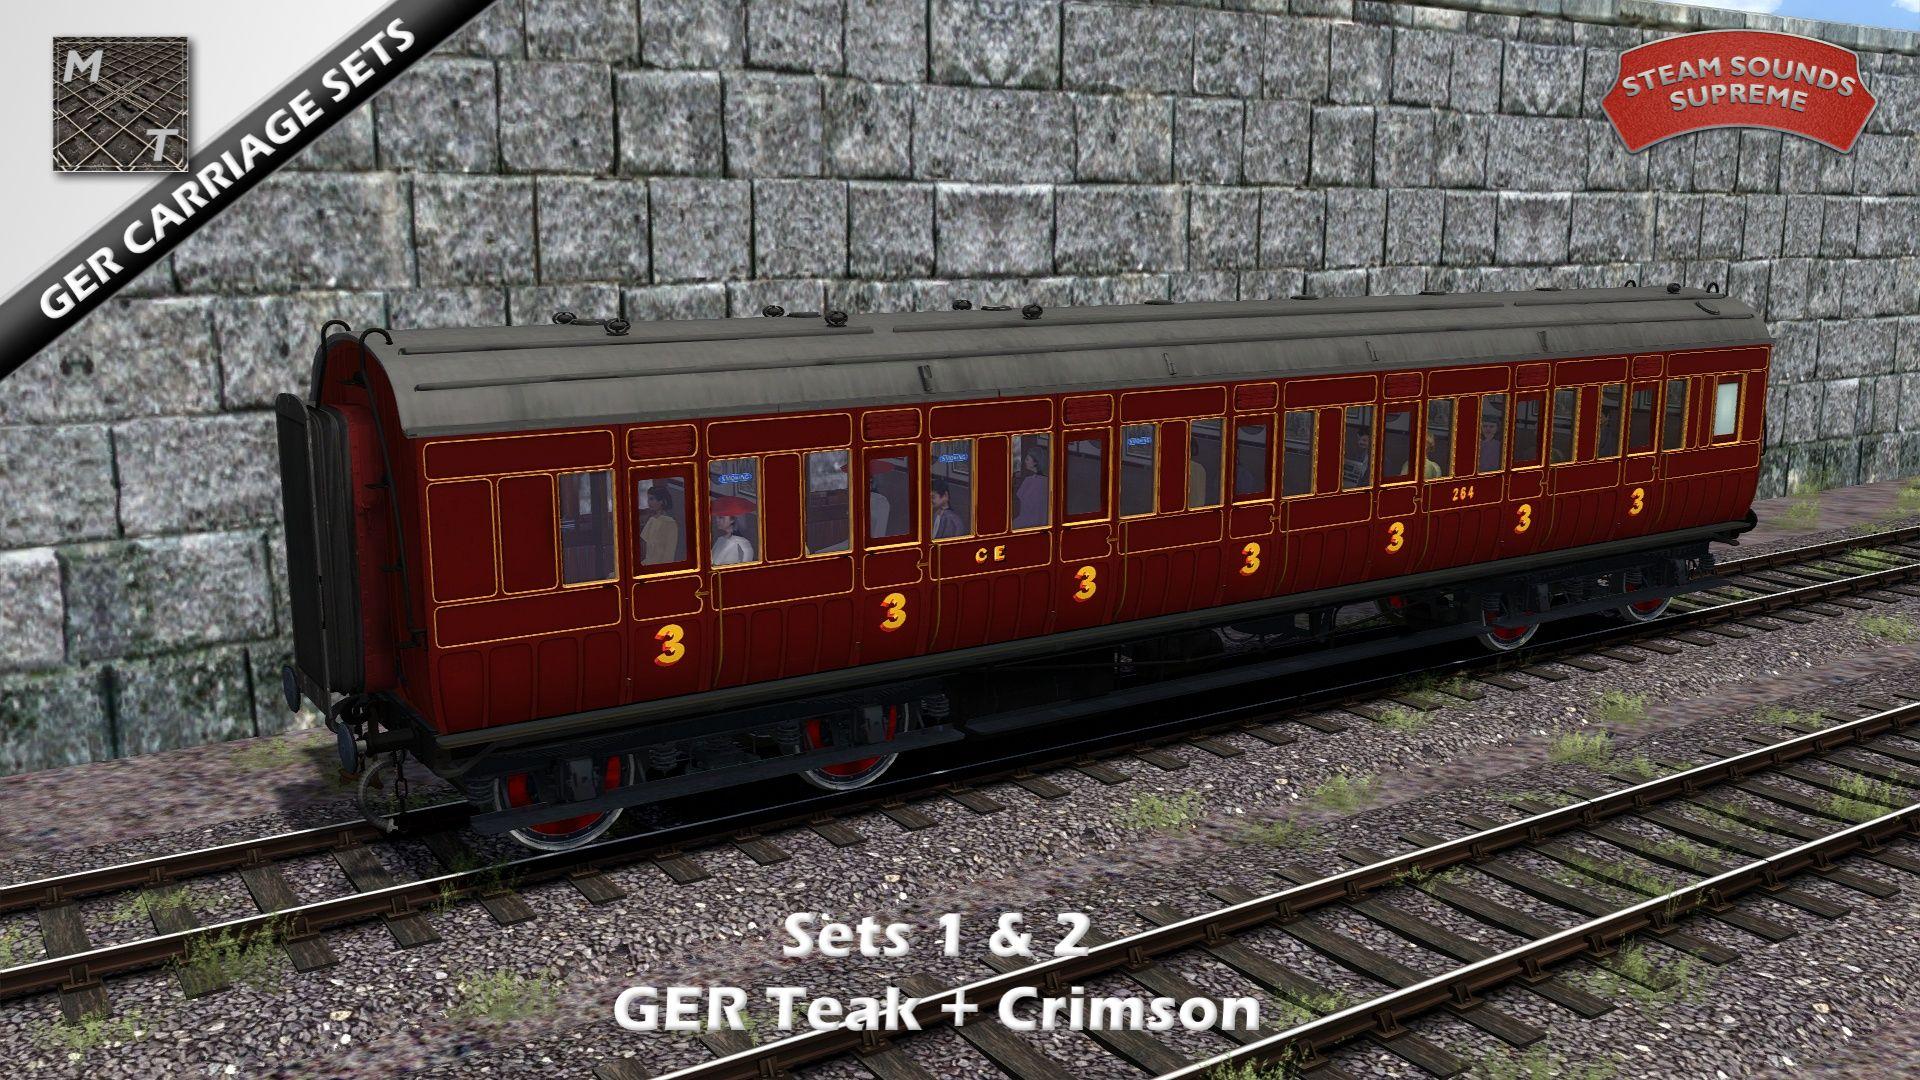 GERCorrSet1-2_22.jpg